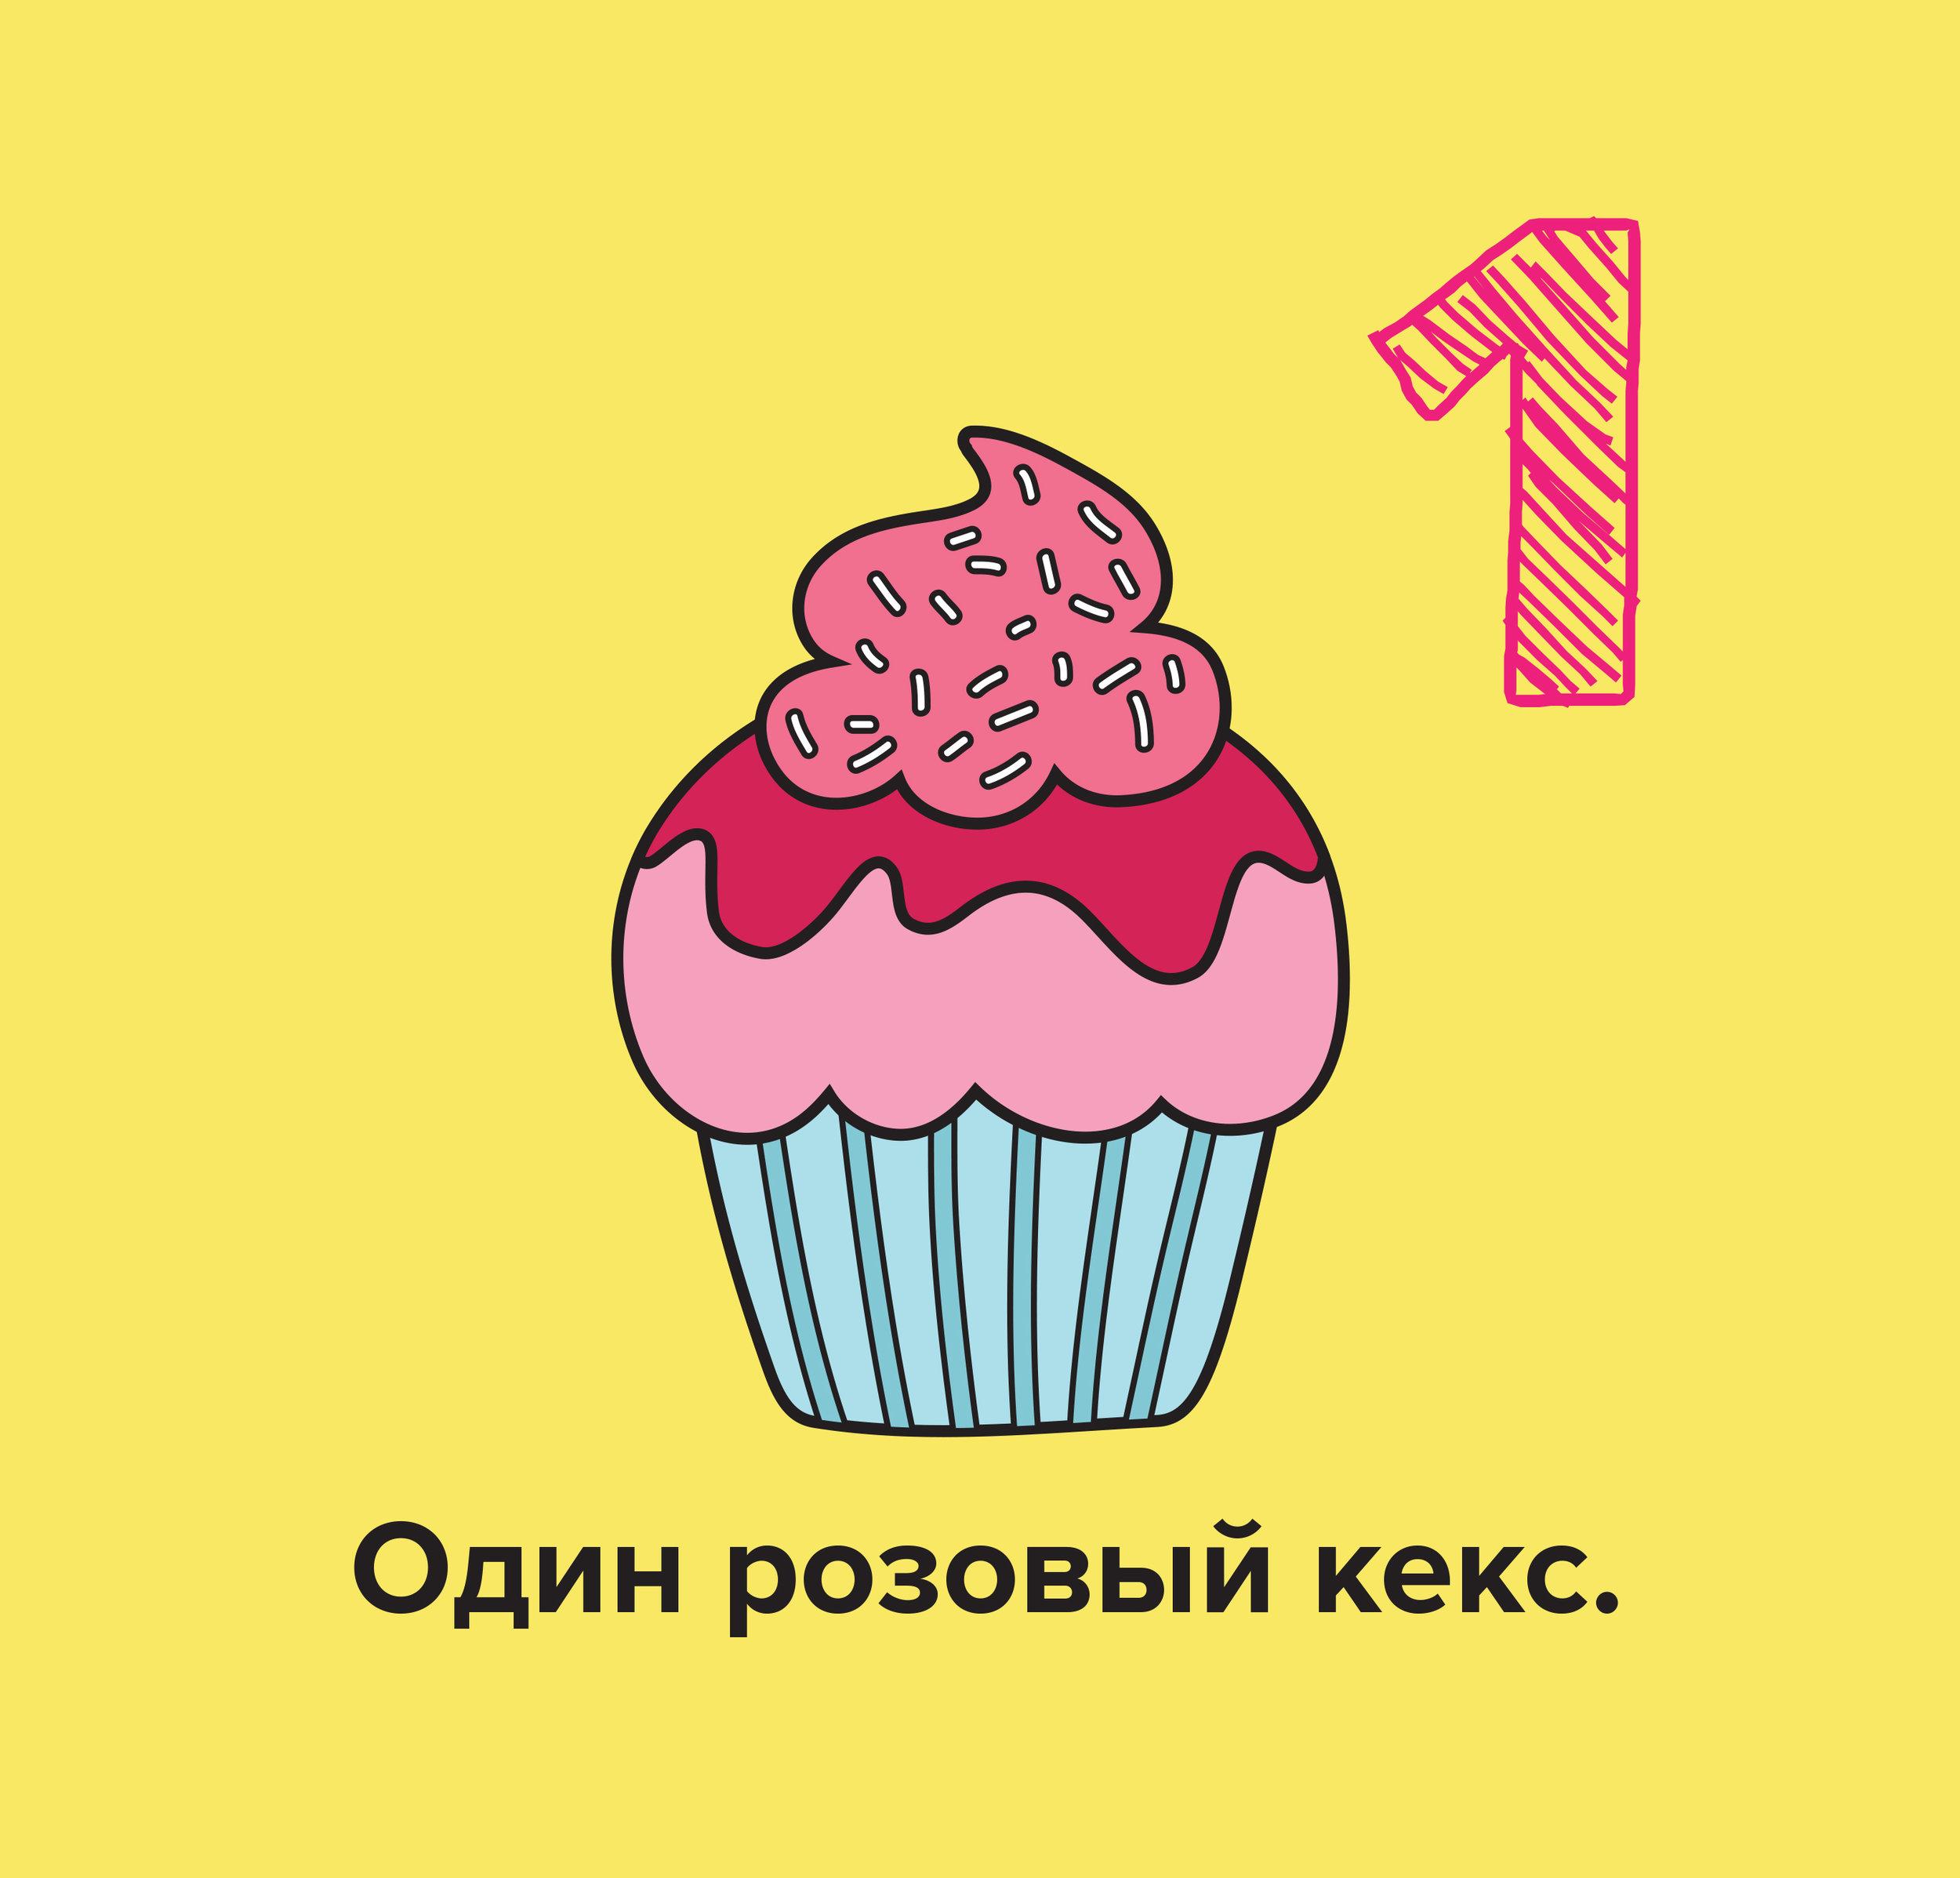 cupcake_rs1.jpg